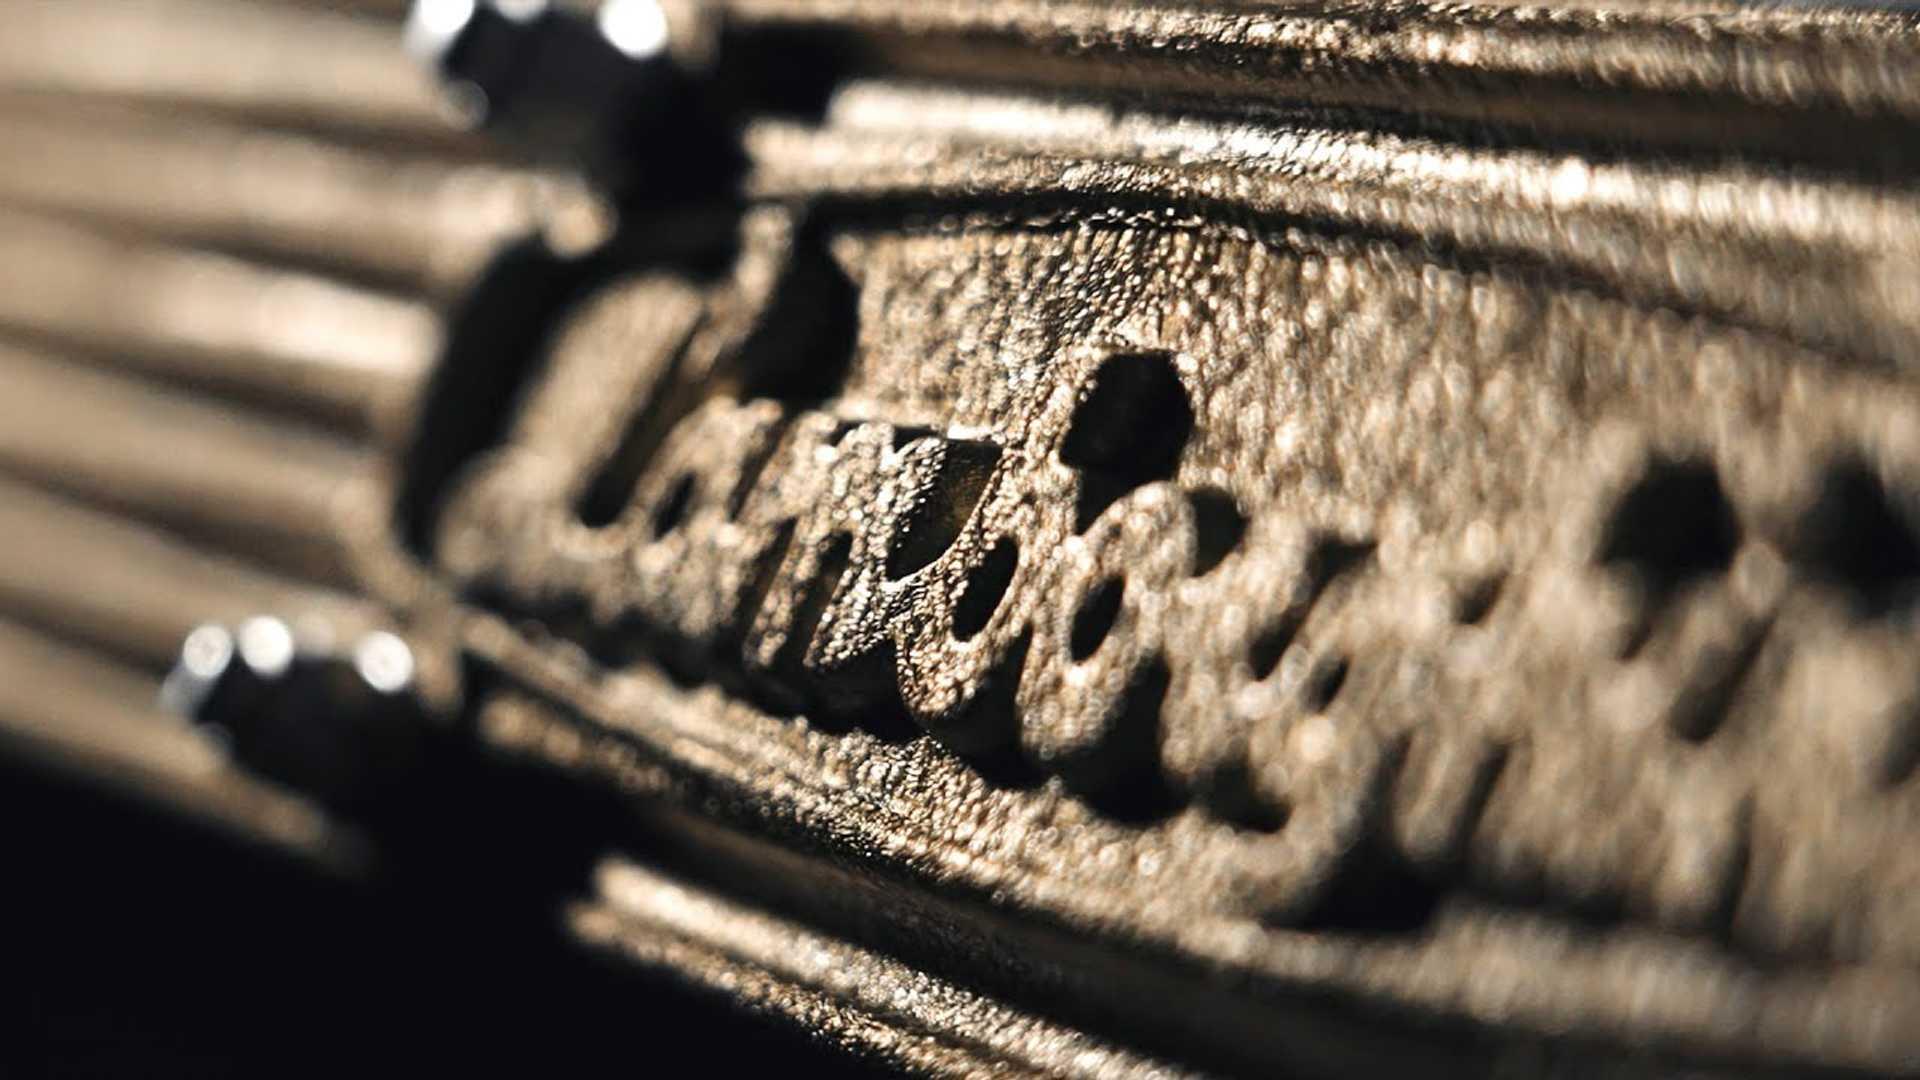 Lamborghini continues teasing game for new restoration project - Motor1 UK